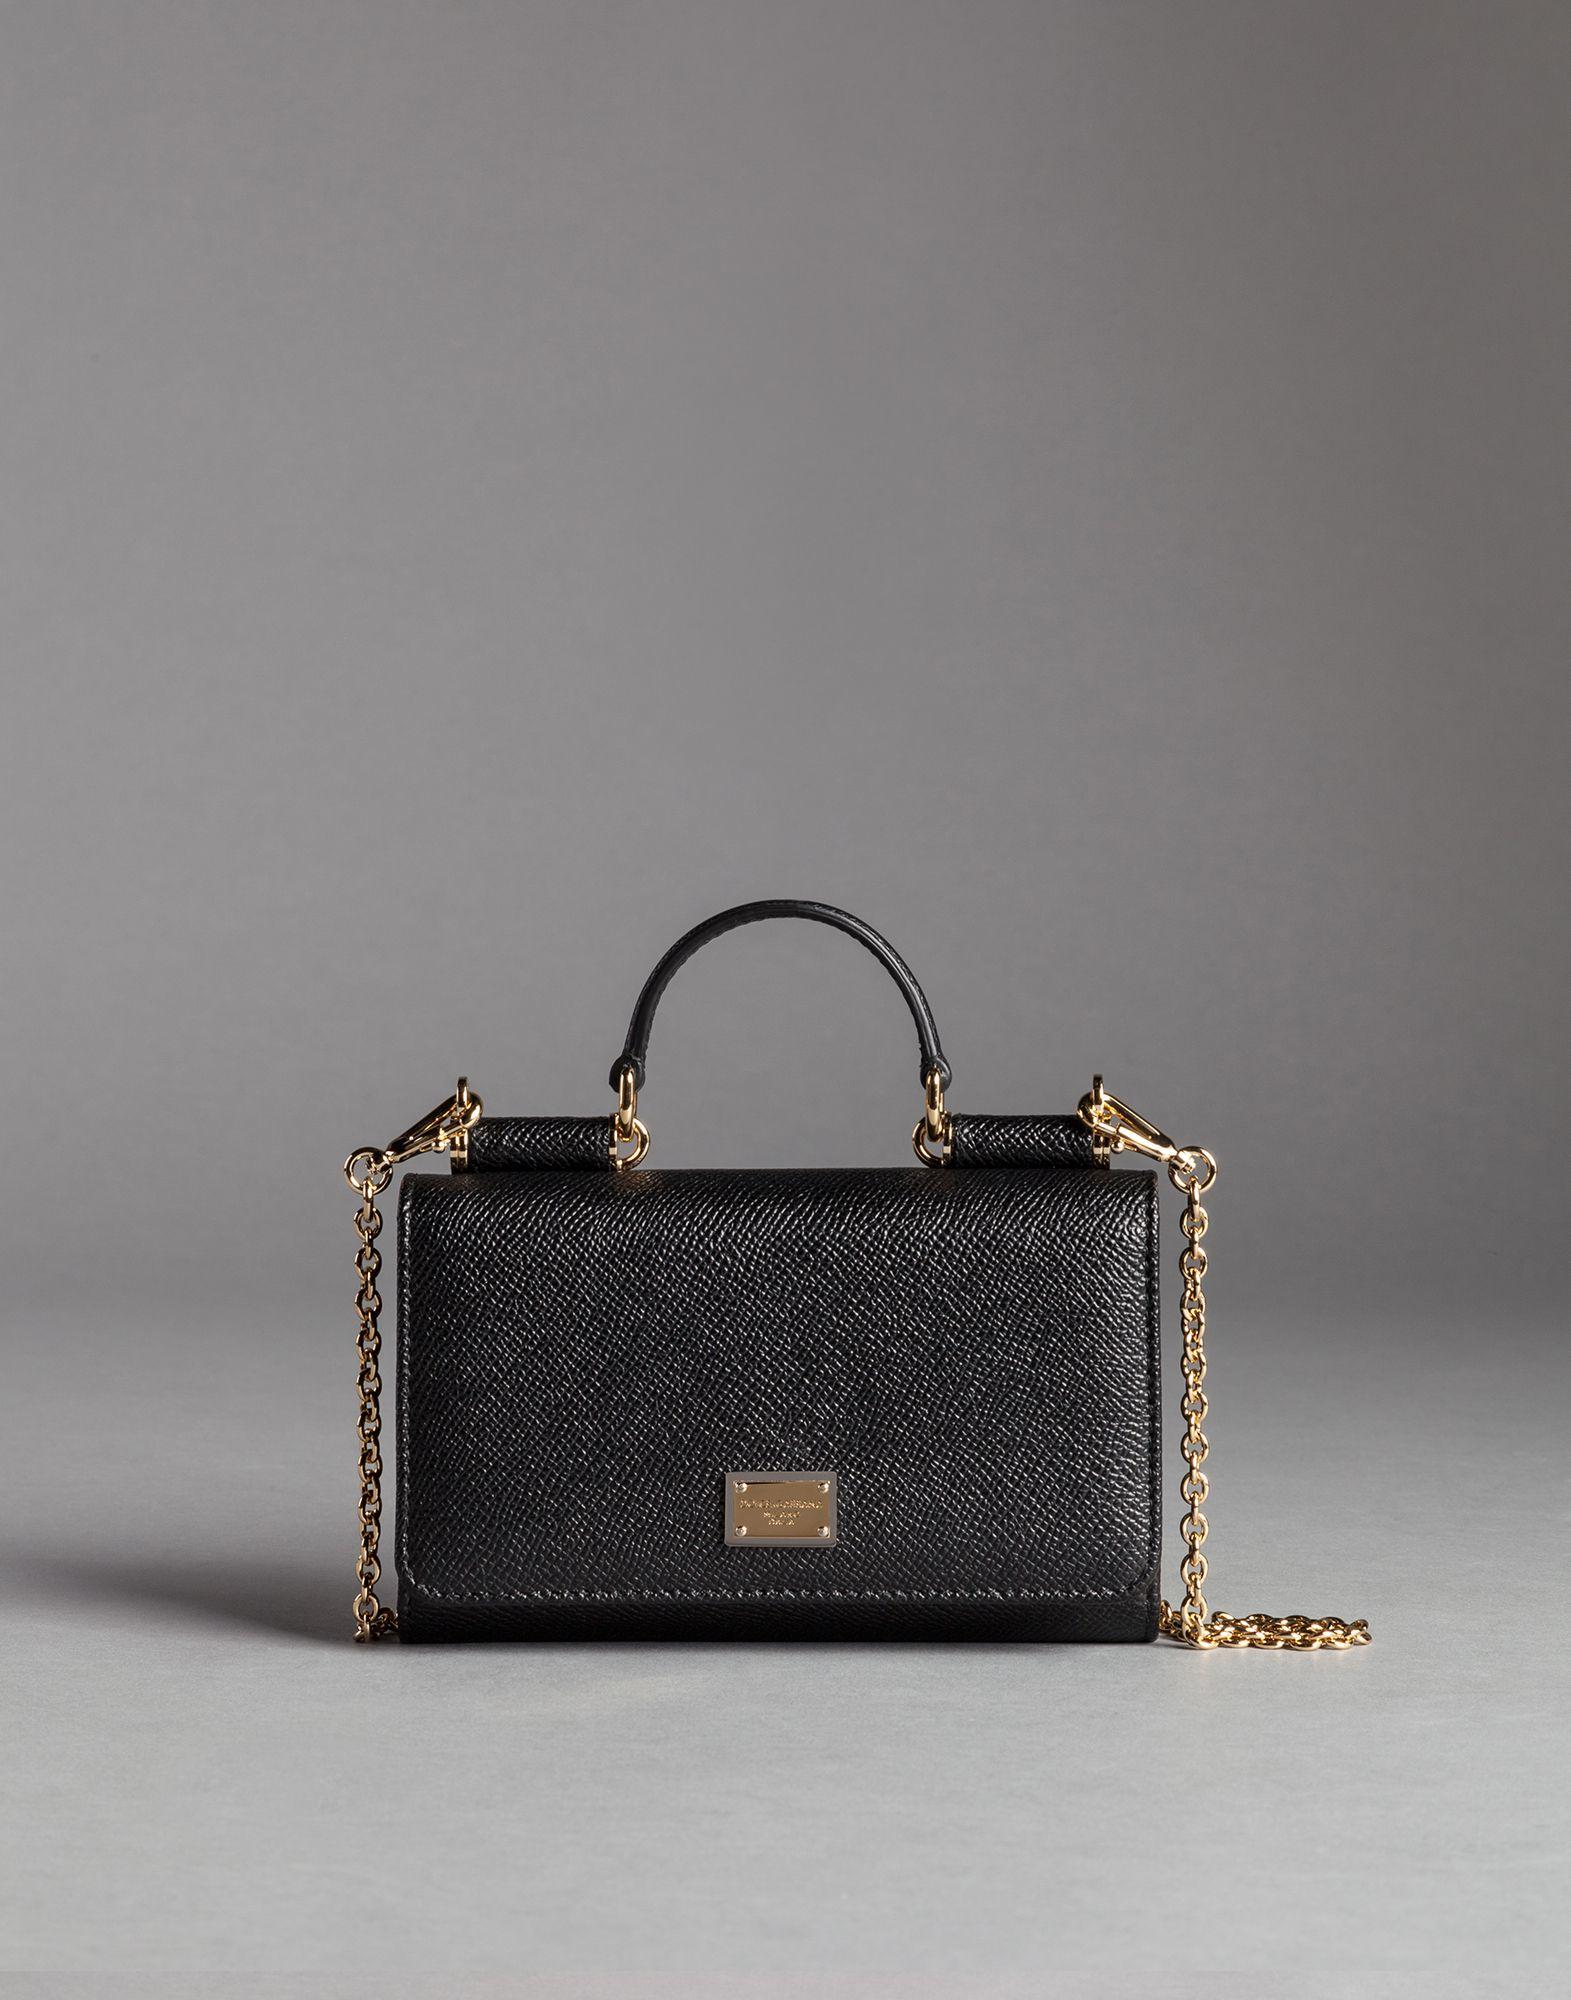 ... new products 01899 086ac Lyst - Dolce Gabbana Mini Von Bag In Dauphine  Print Leather ... 749e4743e5a04